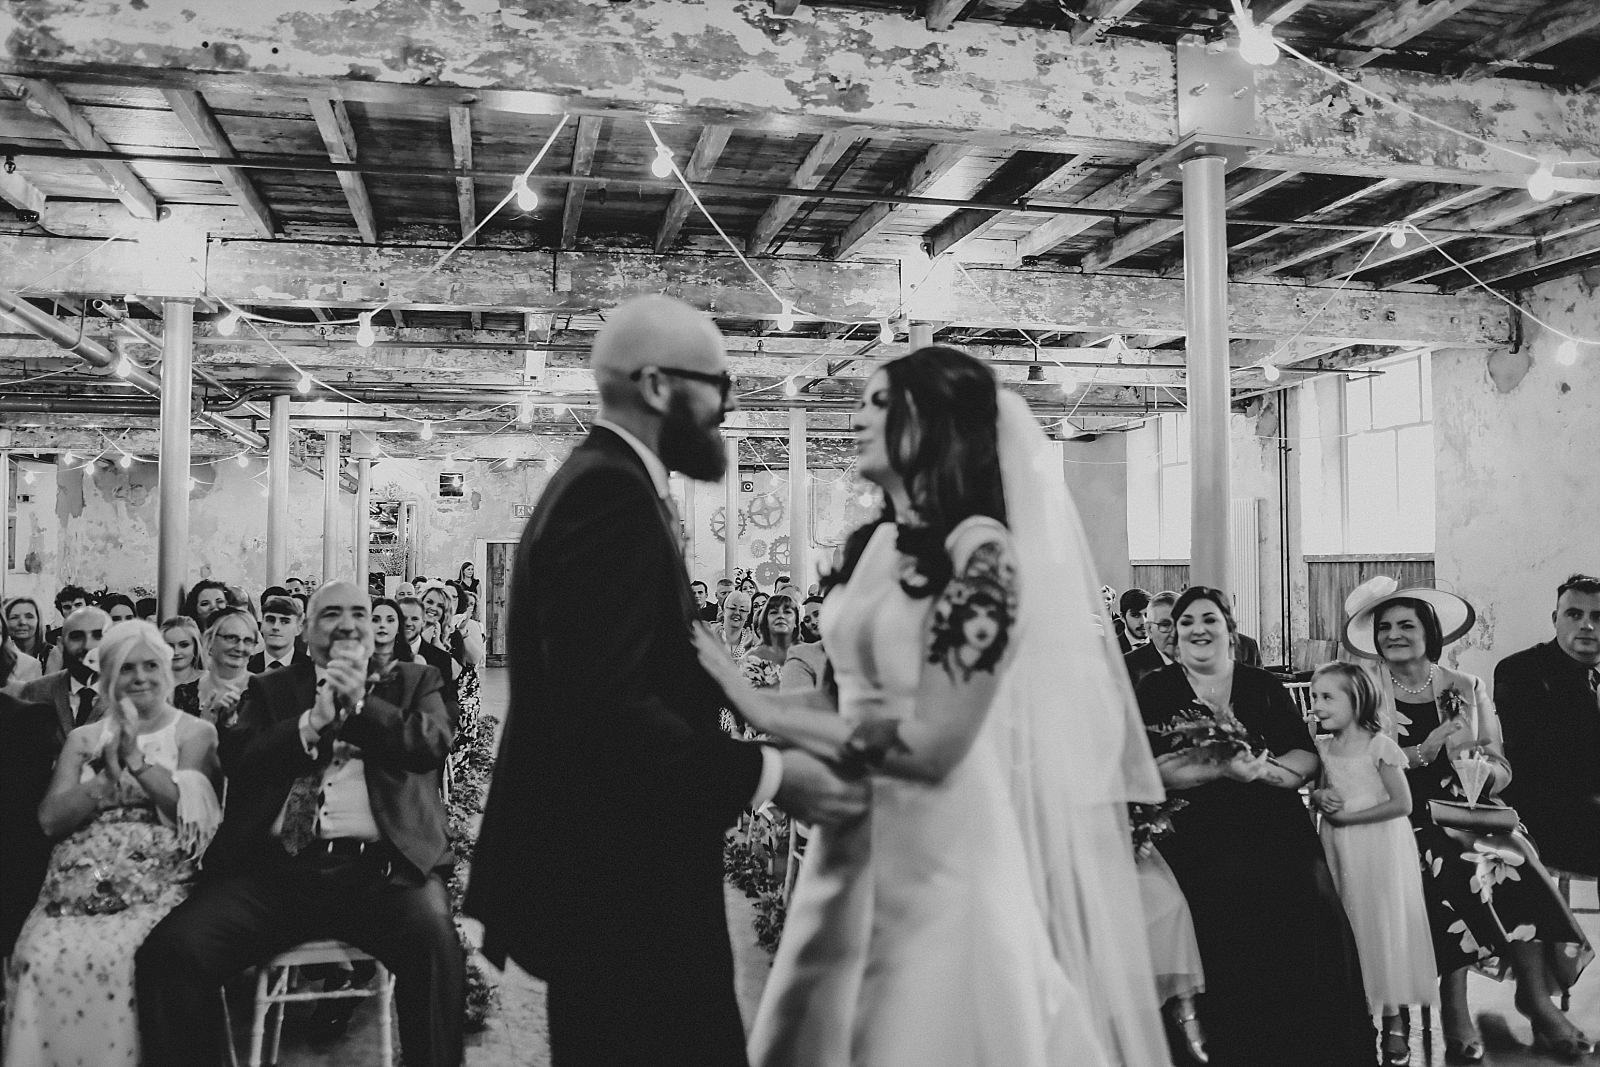 bride and groom in love in an industrial wedding venue